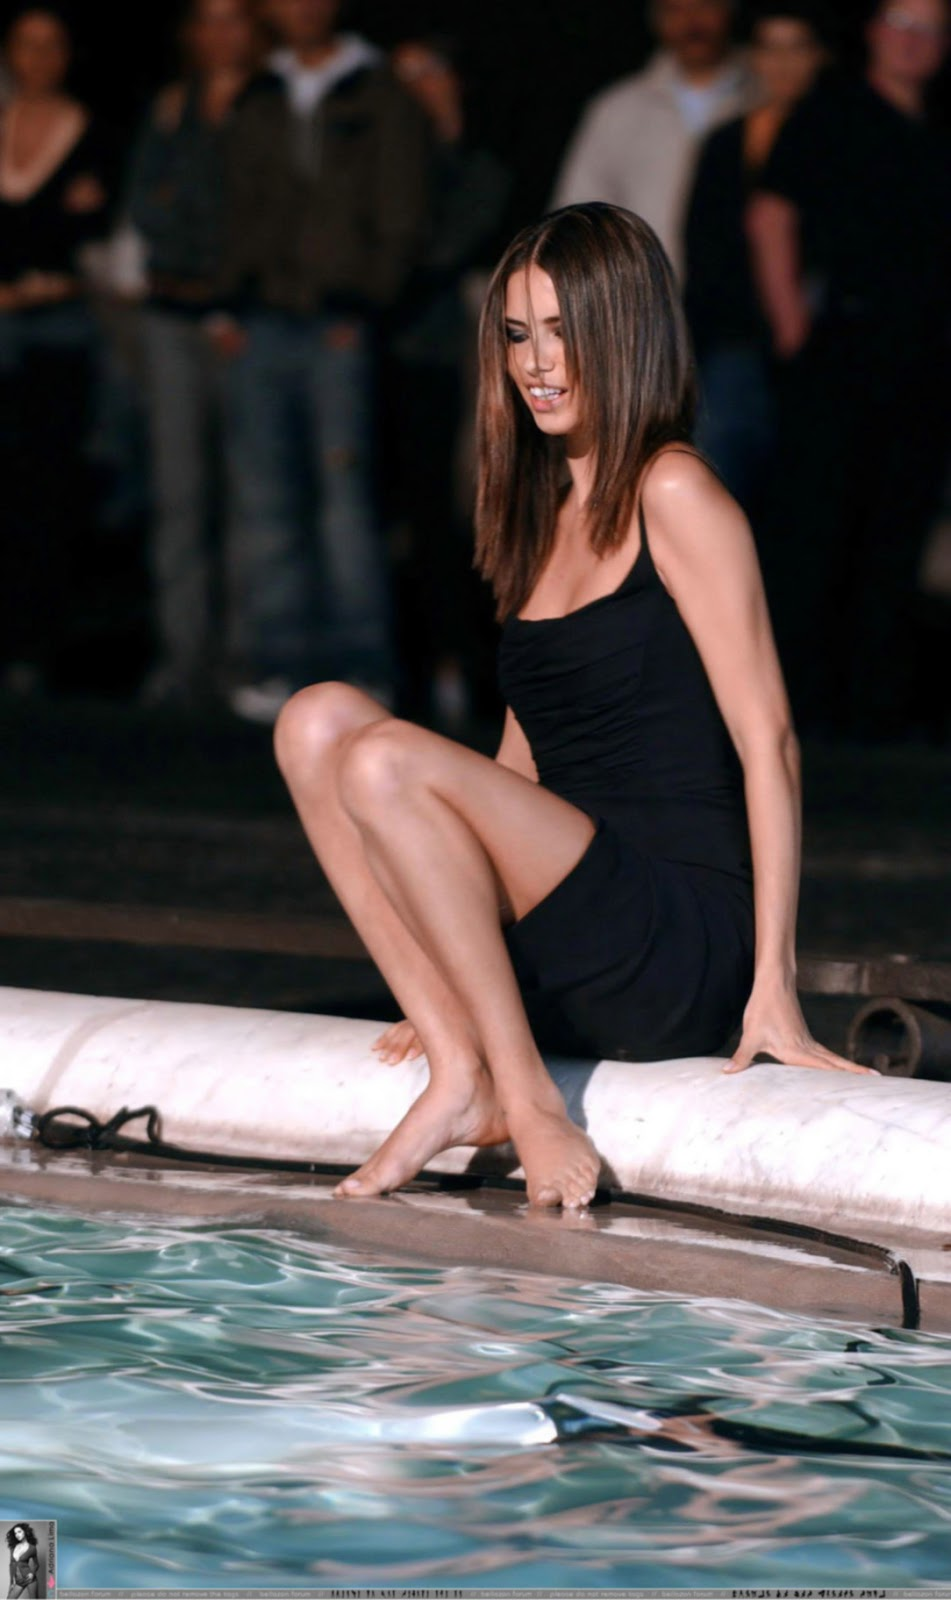 Adriana Lima Hd Feet Photos Sexy Feet Capture - Celebrity -2204